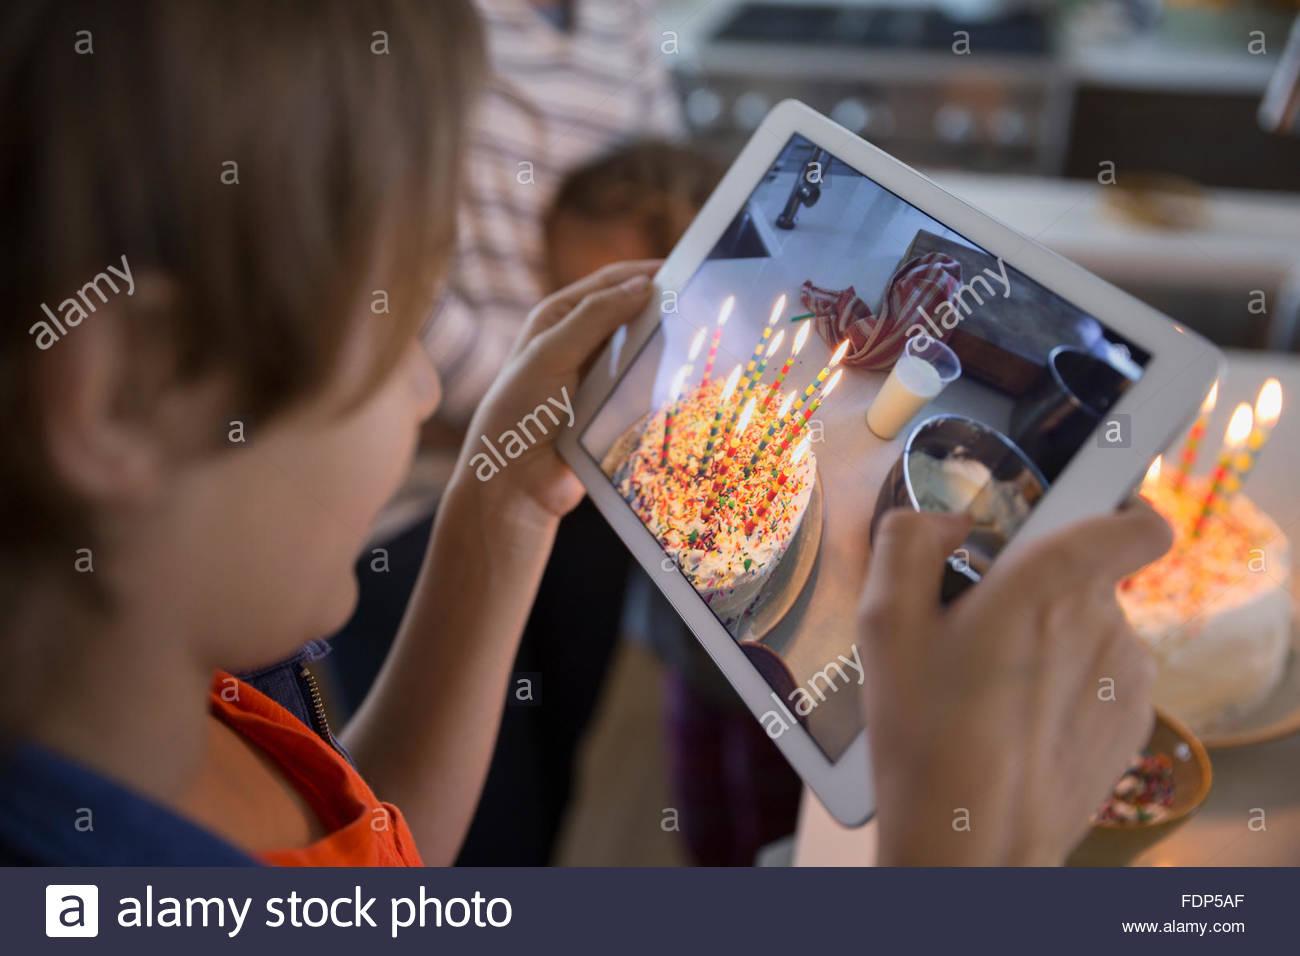 Boy fotografiar tarta de cumpleaños con velas Imagen De Stock